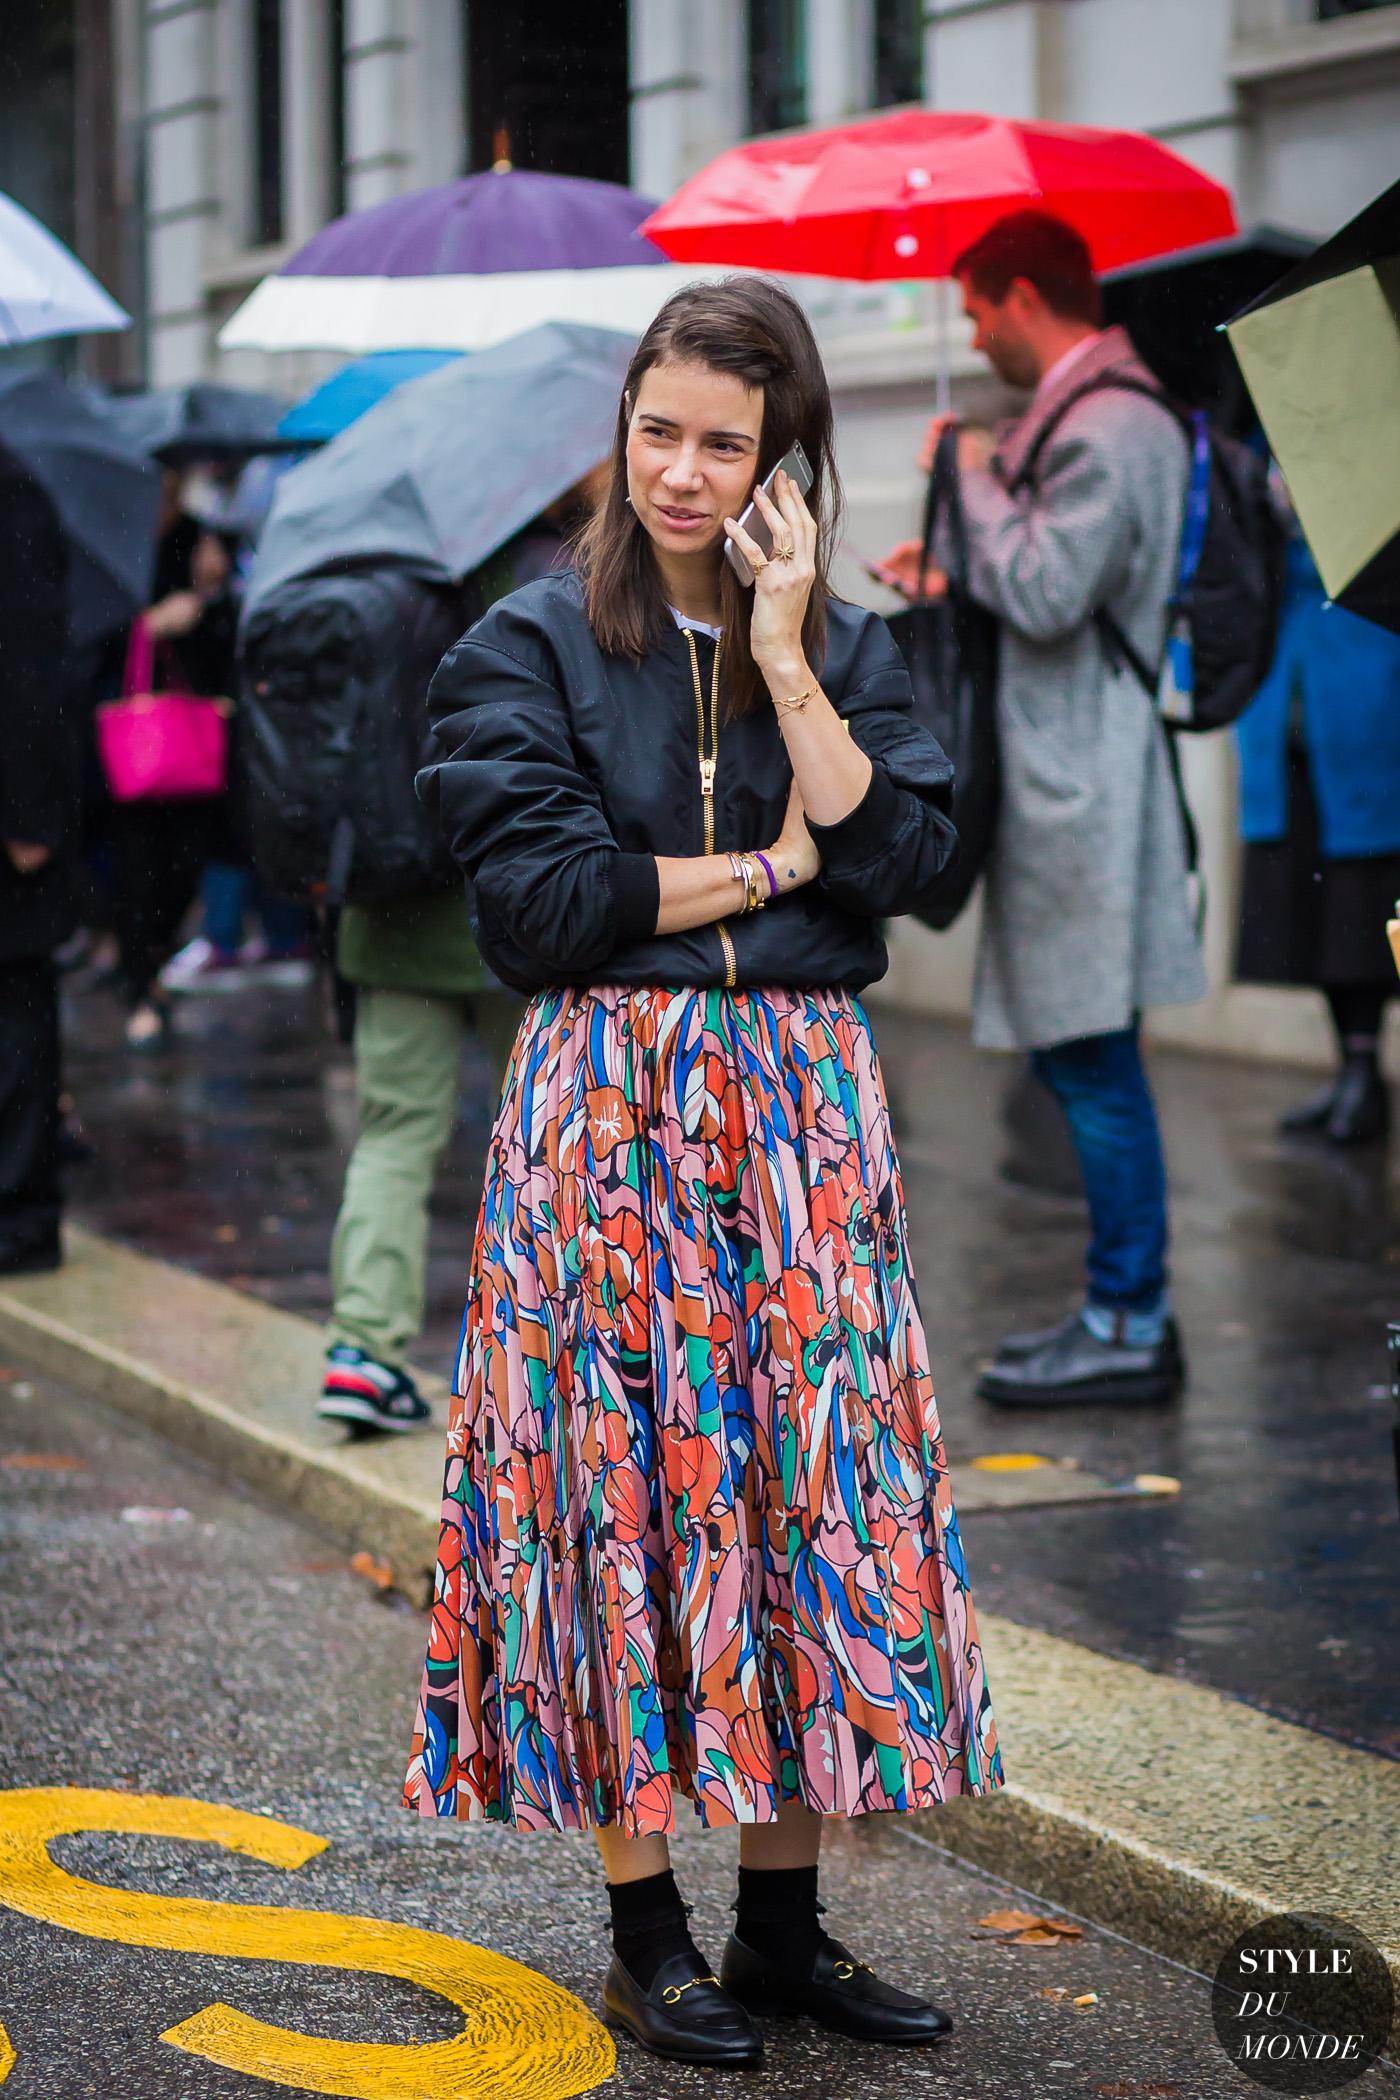 Natasha-Goldenberg-by-STYLEDUMONDE-Street-Style-Fashion-Photography0E2A2174.jpg